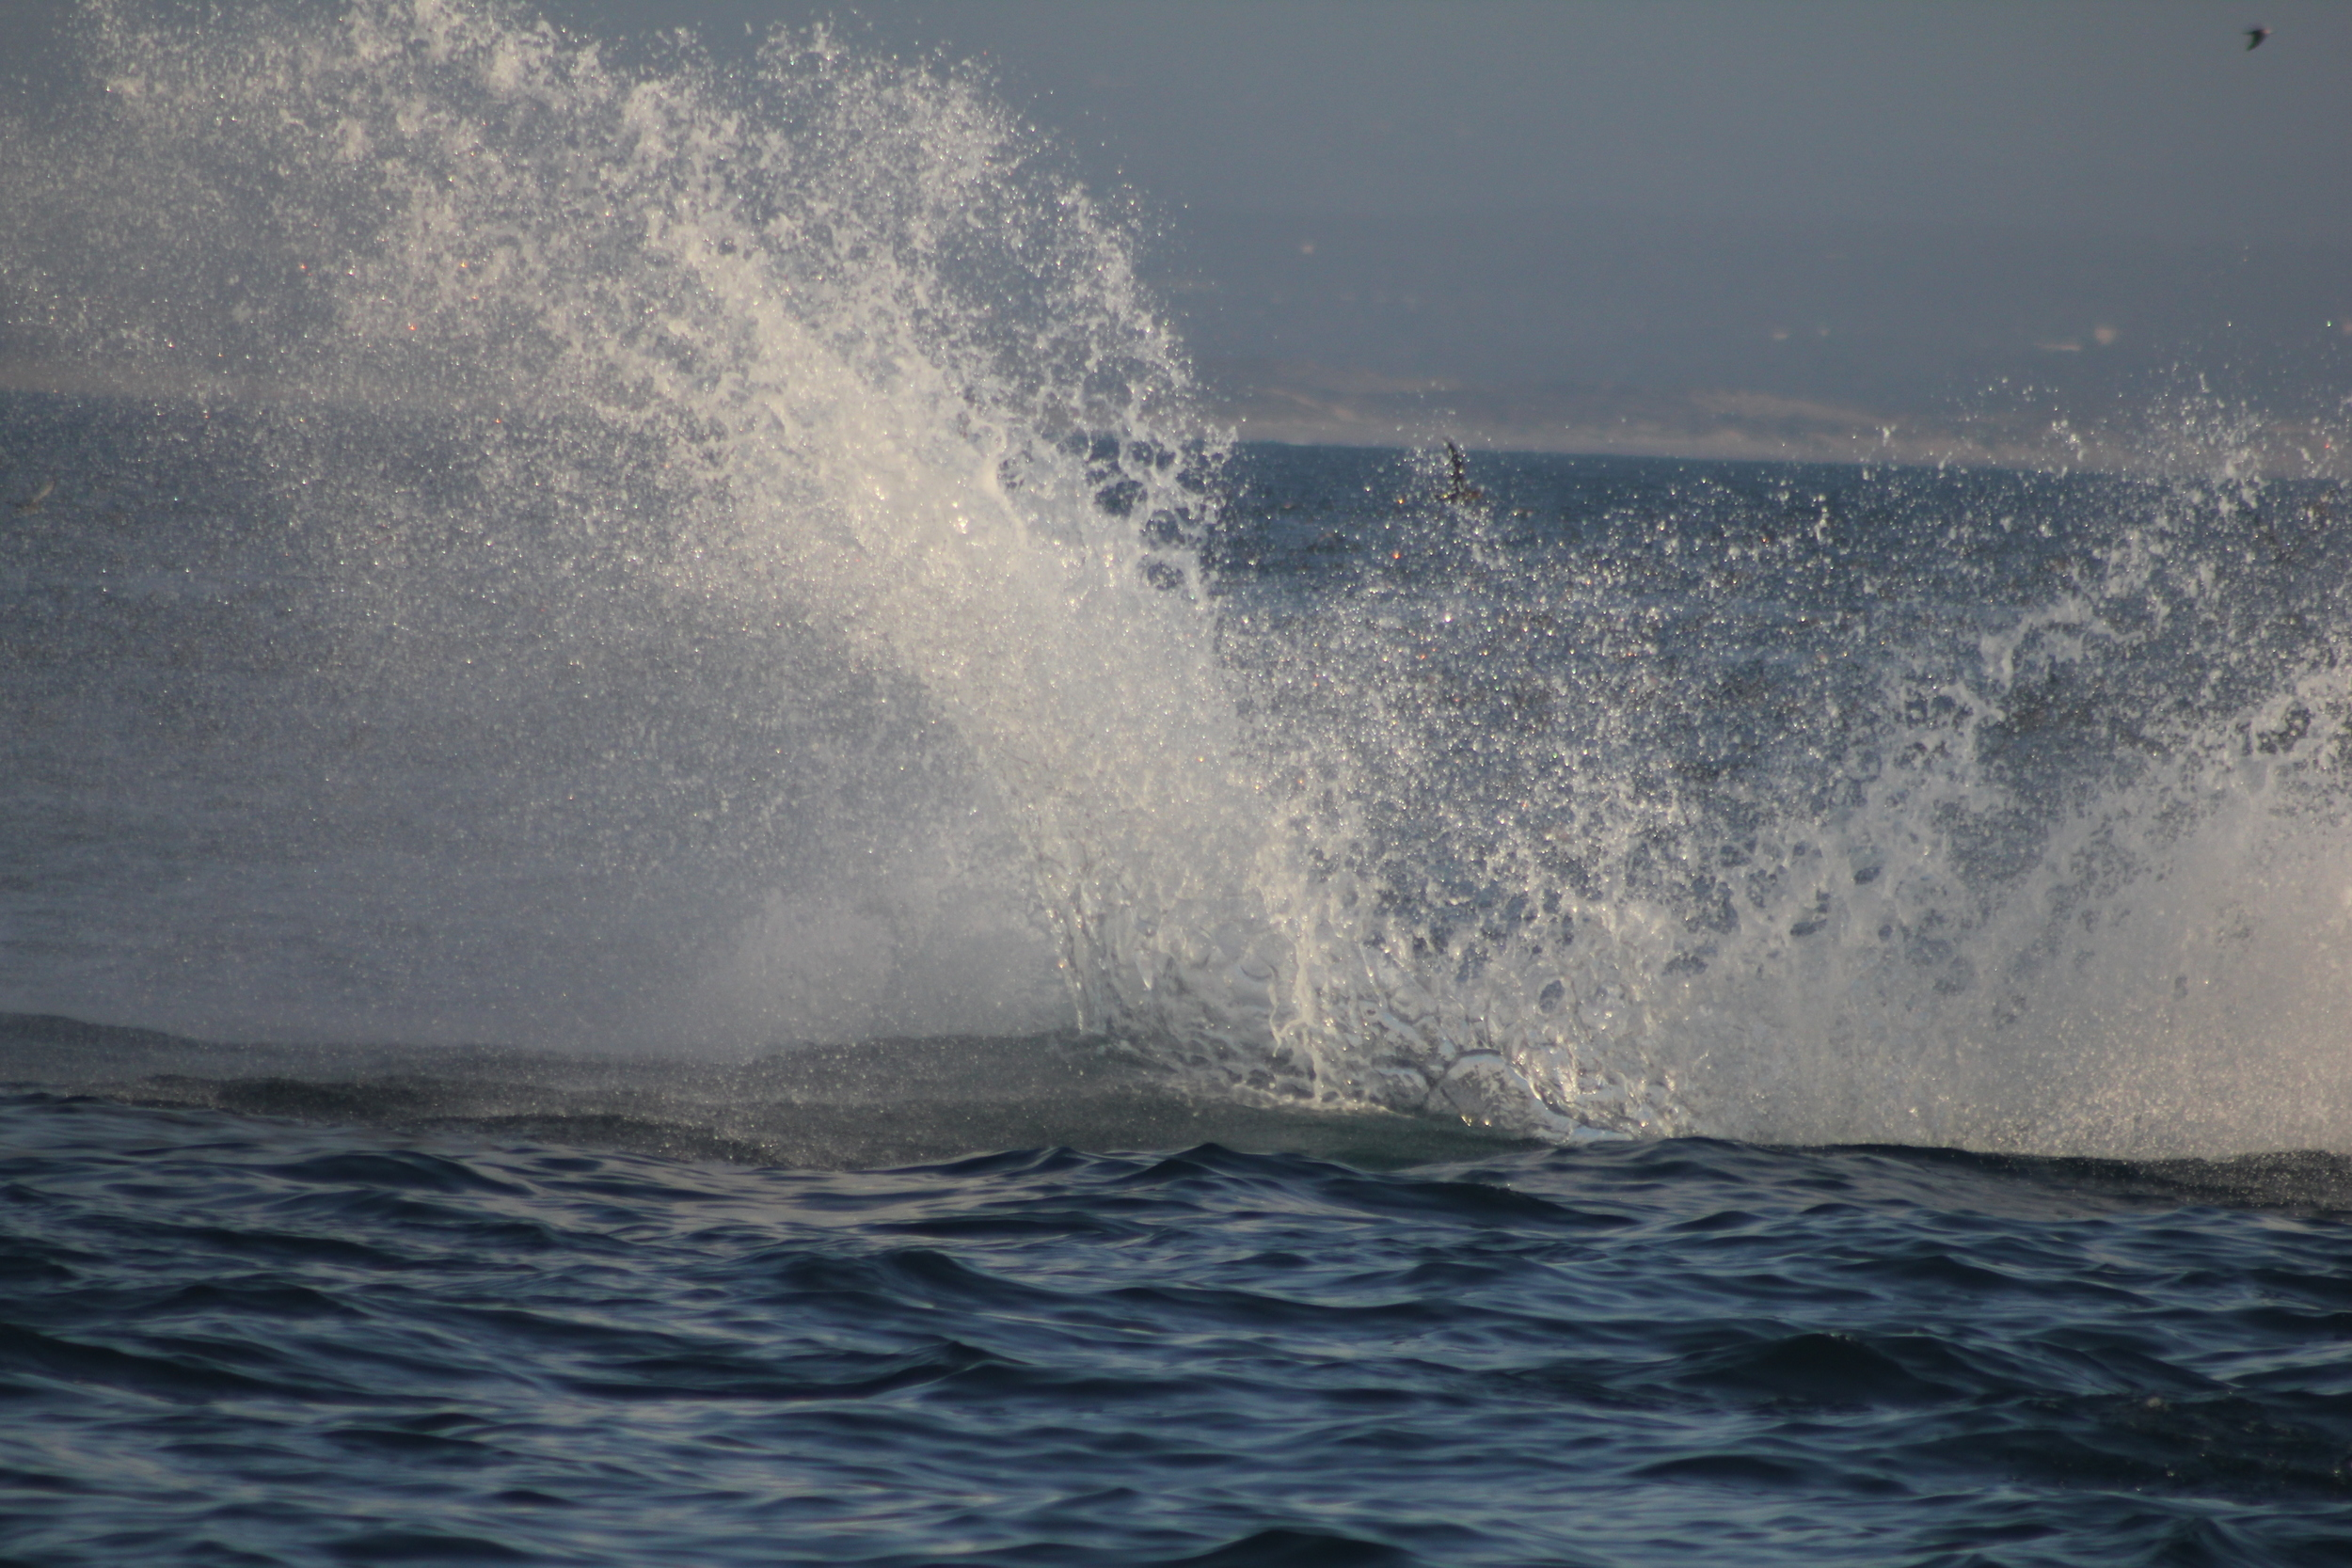 Splashes from a Humpback Whale Breach, Monterey Bay, California  Photo Credit: Liz Summit, 2014